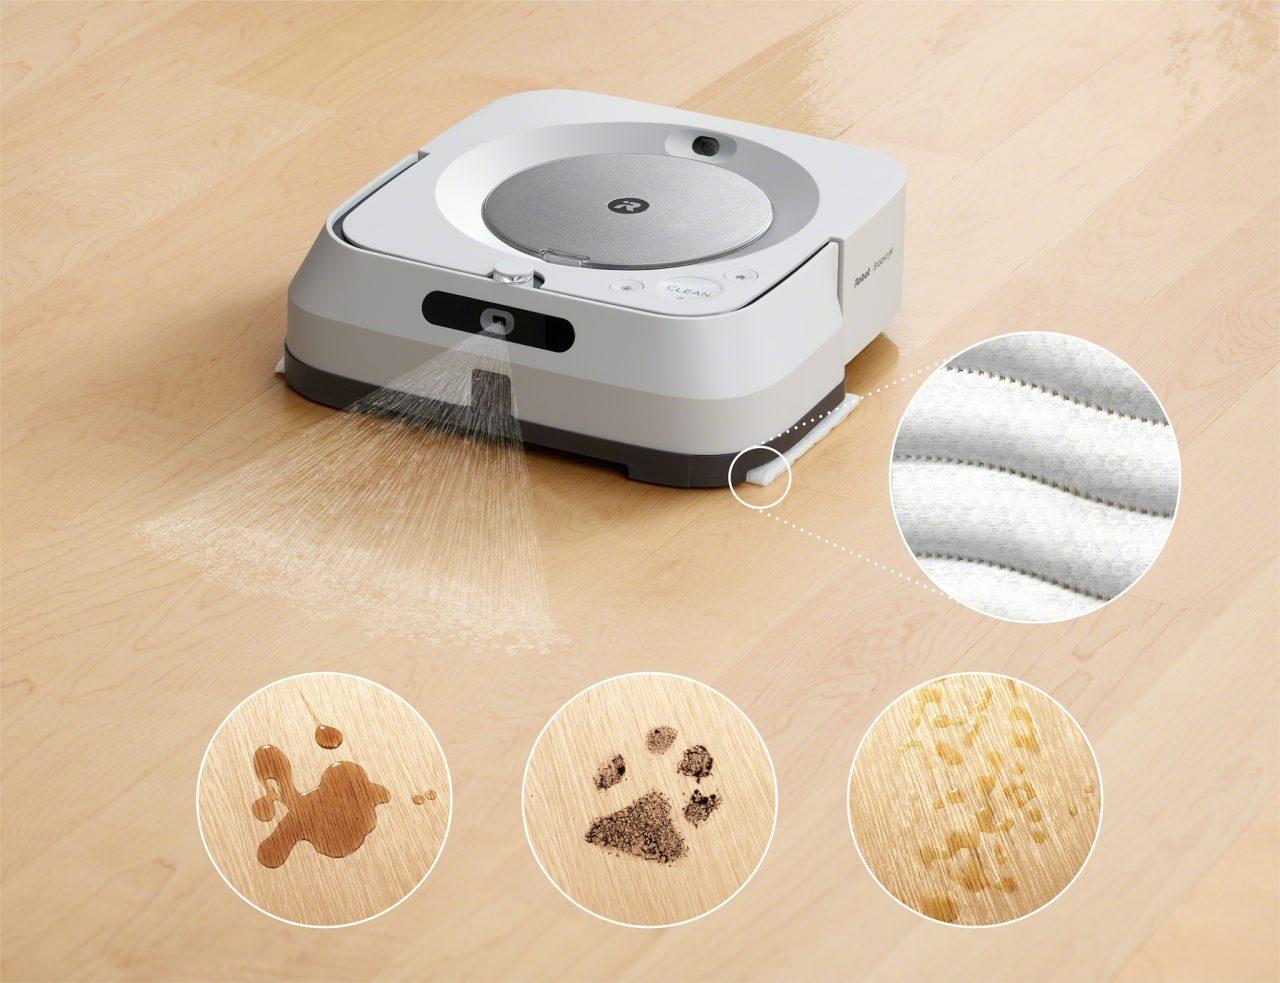 Il dinamico duo che aspira e pulisce: iRobot Roomba i7+ e Braava jet m6